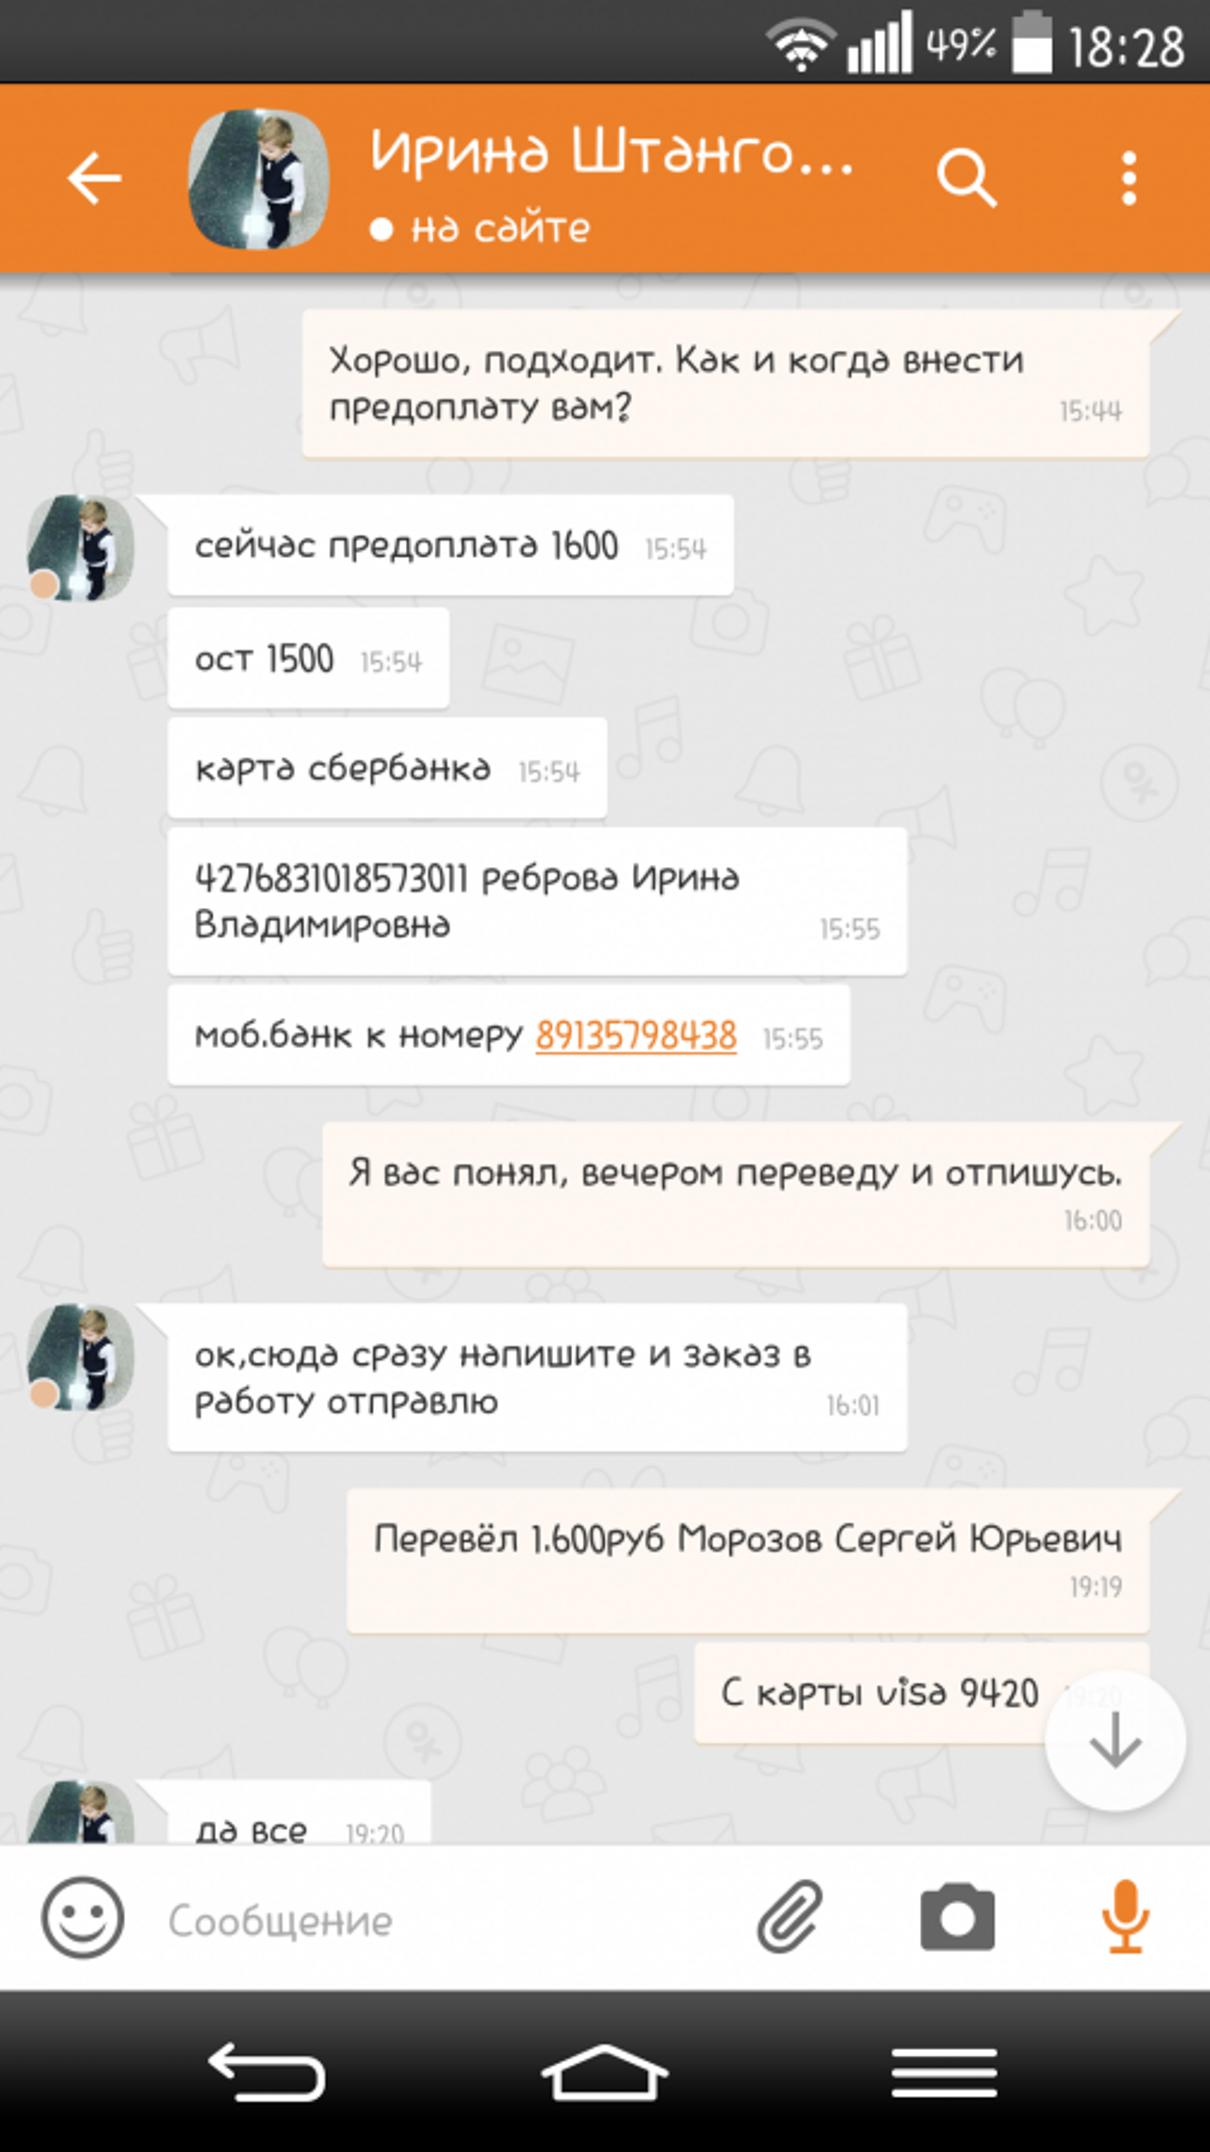 Жалоба-отзыв: Ирина Штанговец (Реброва) - Внимание хамка и хабалка!.  Фото №1